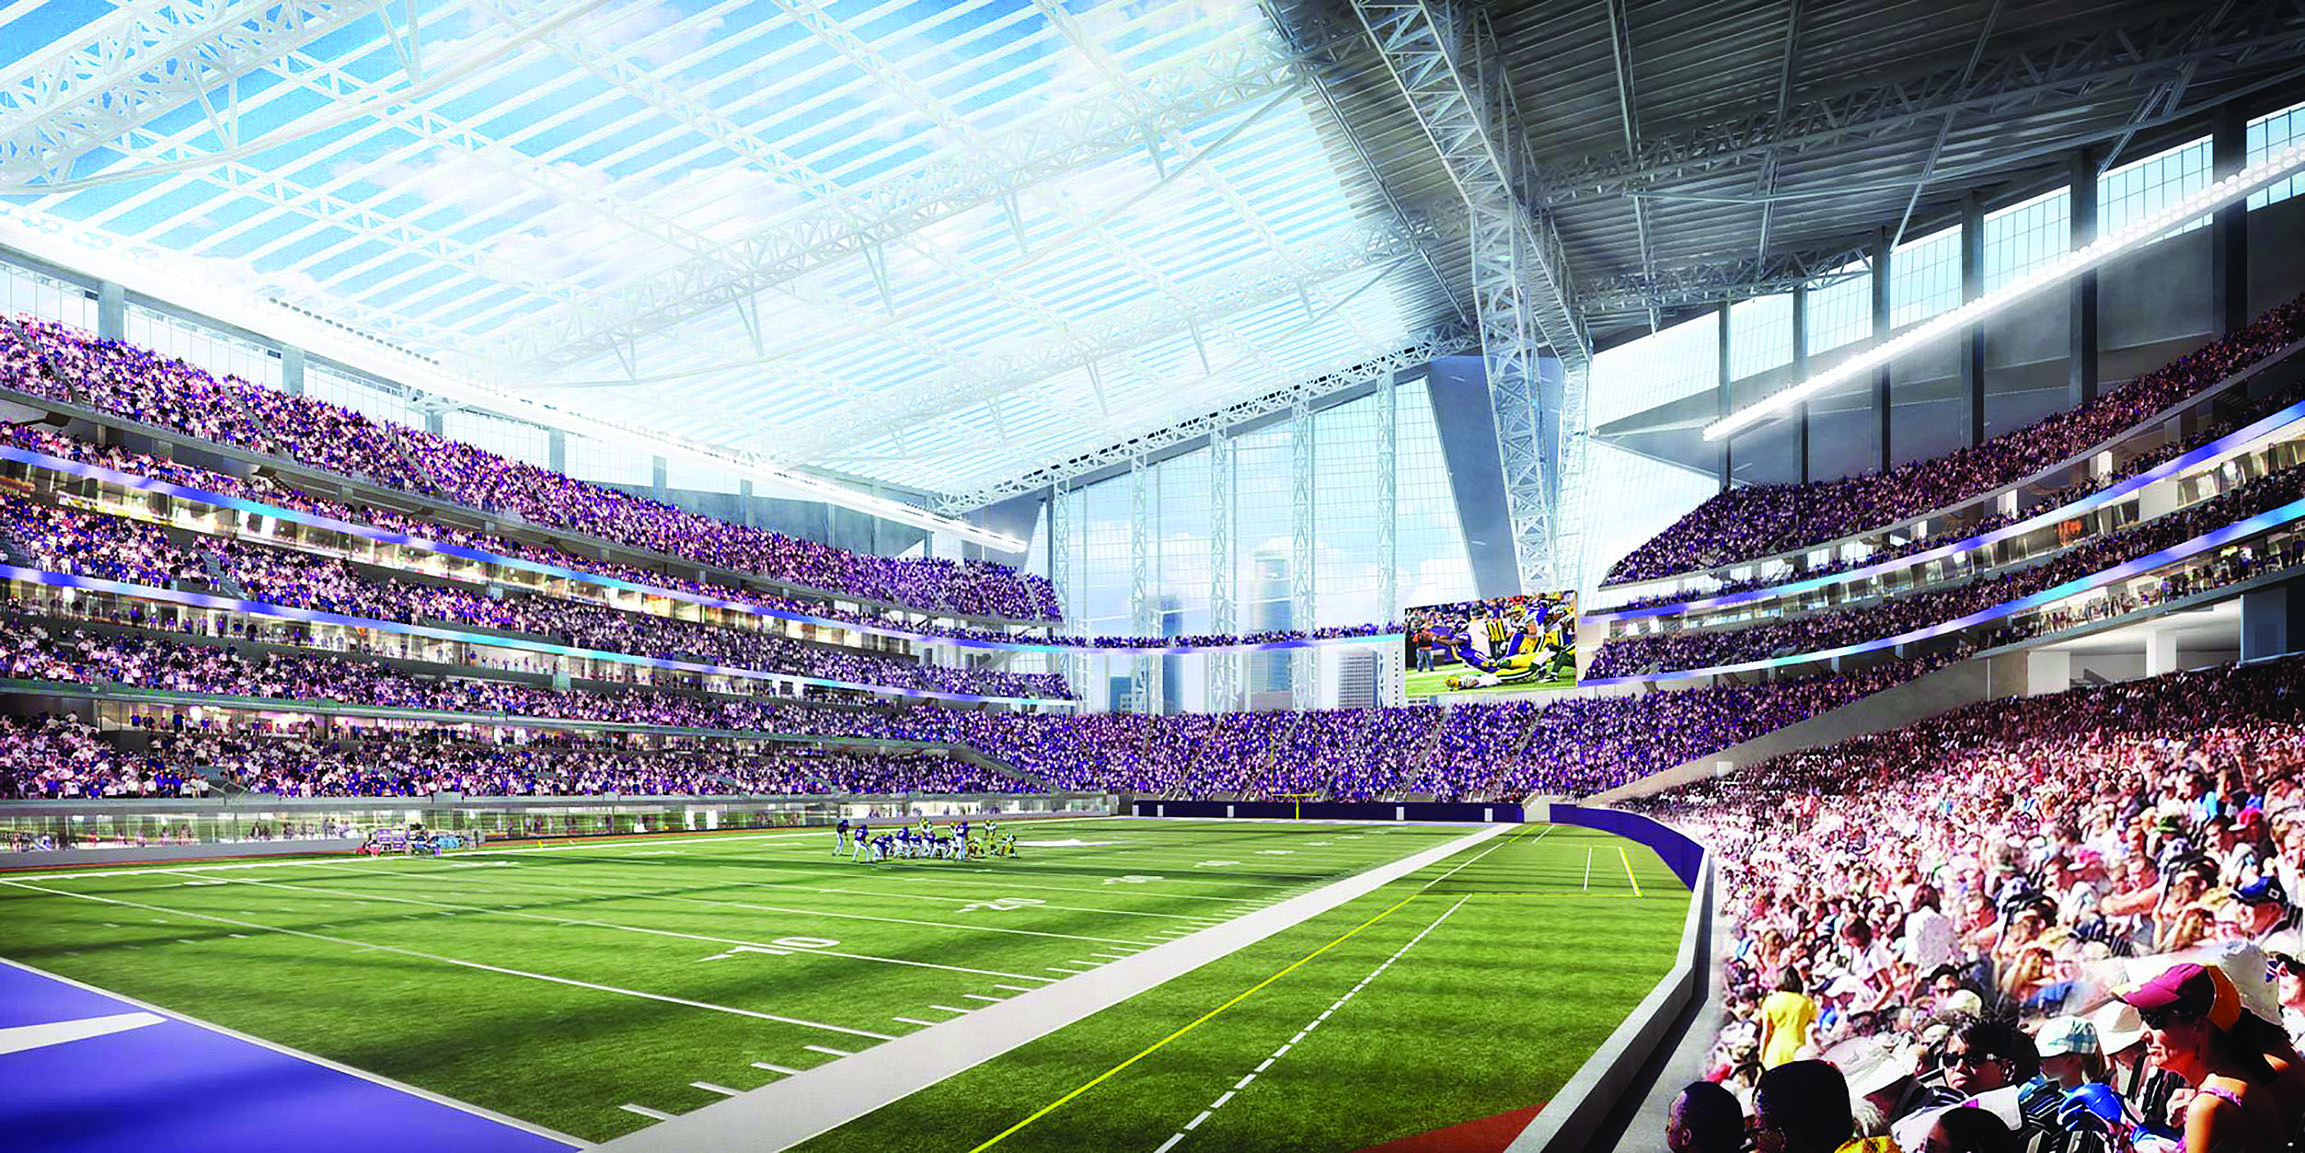 Vikings-tackle-stadium-problems-with-plastics